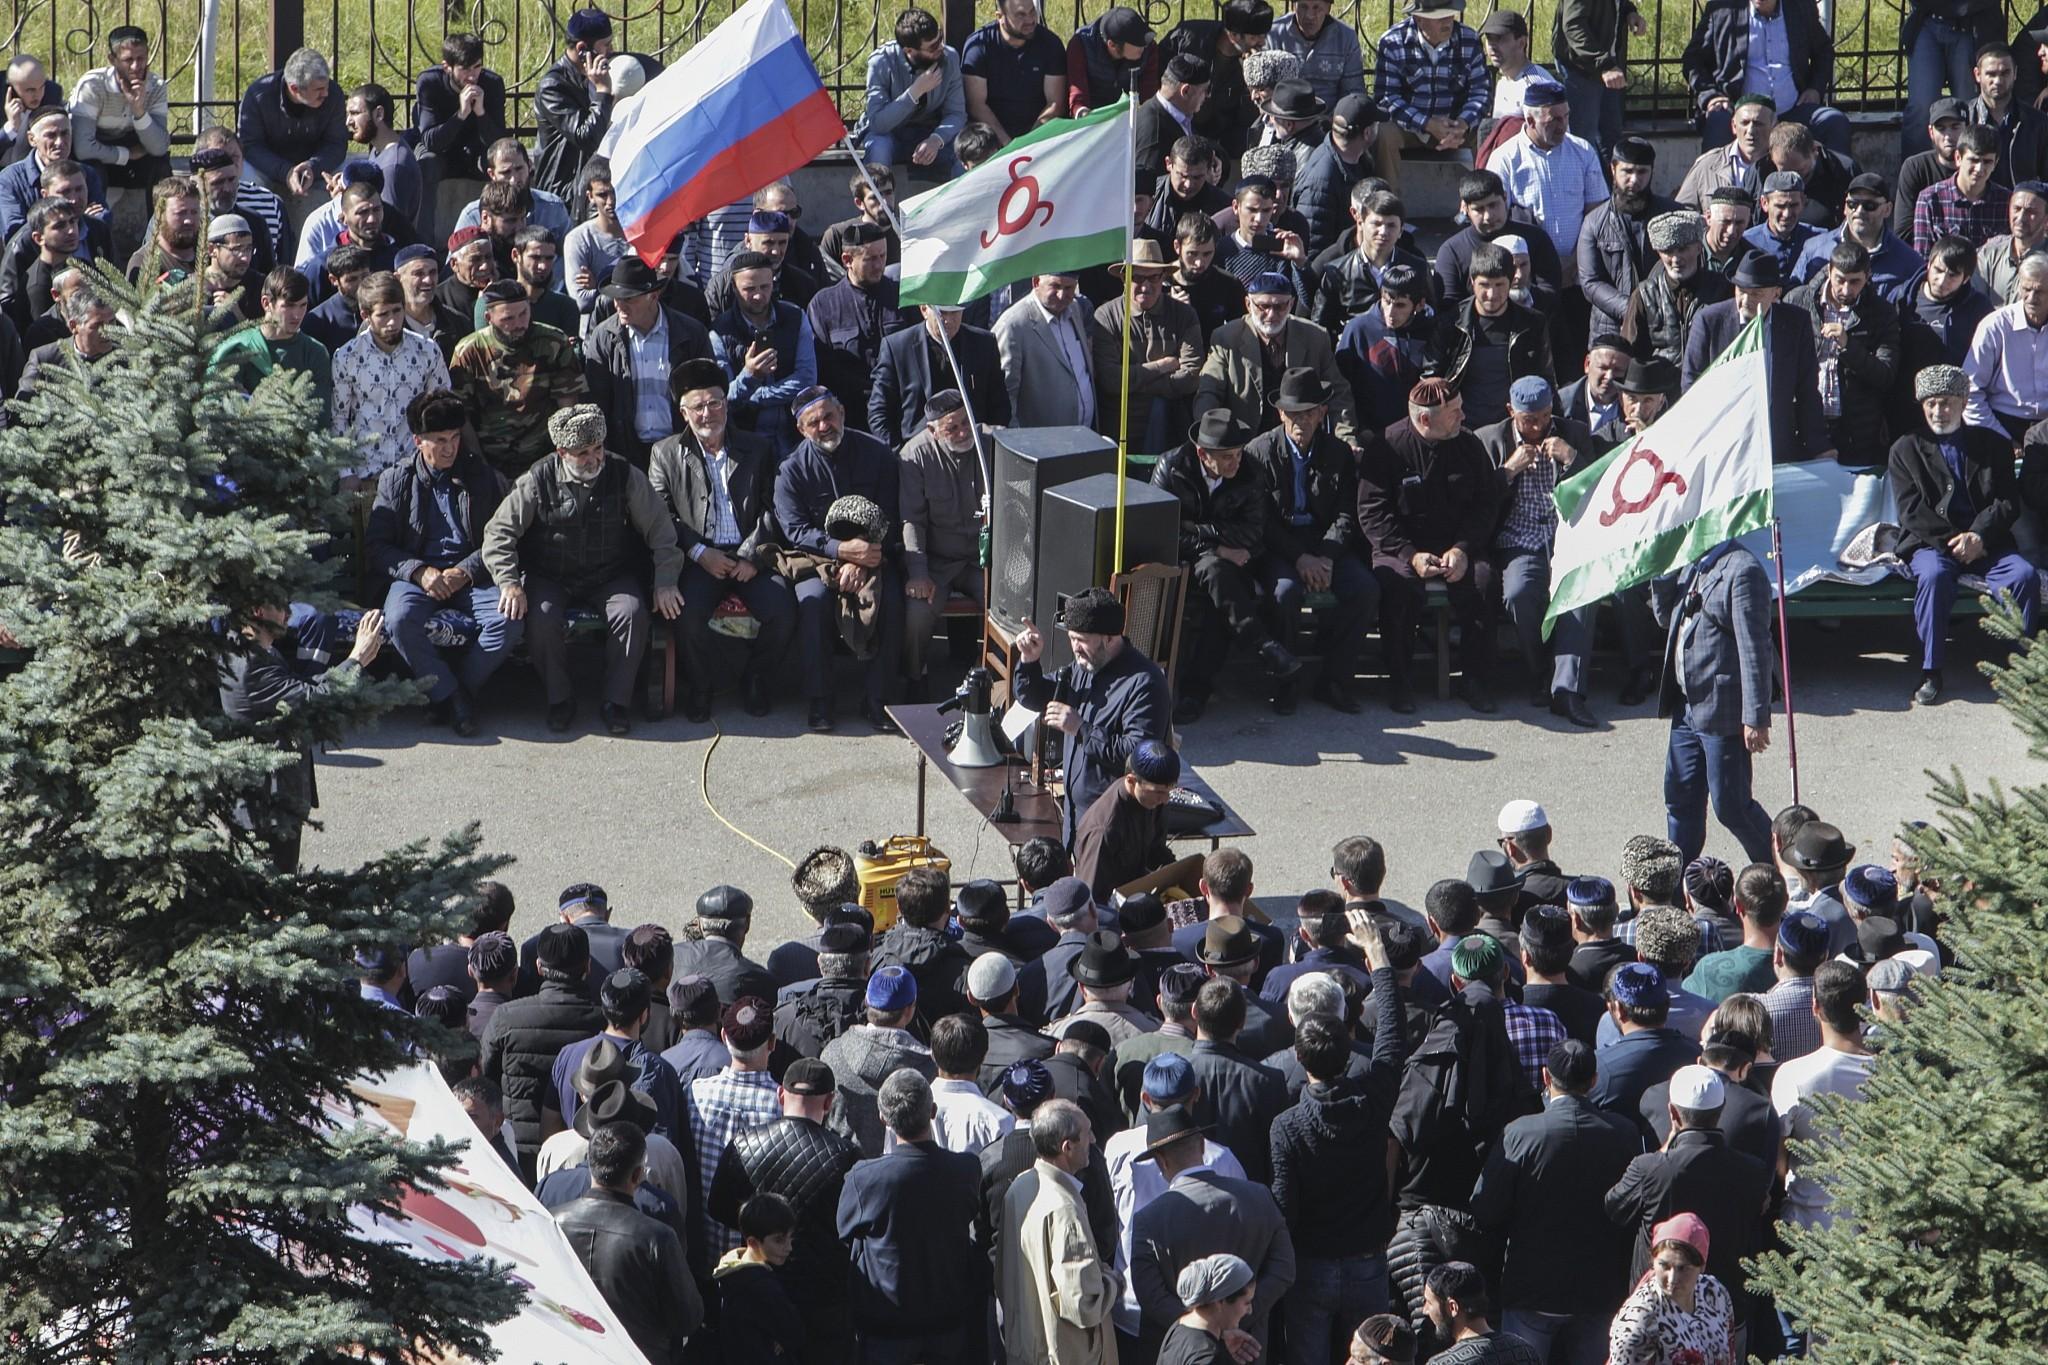 What is happening in Ingushetia now? 20